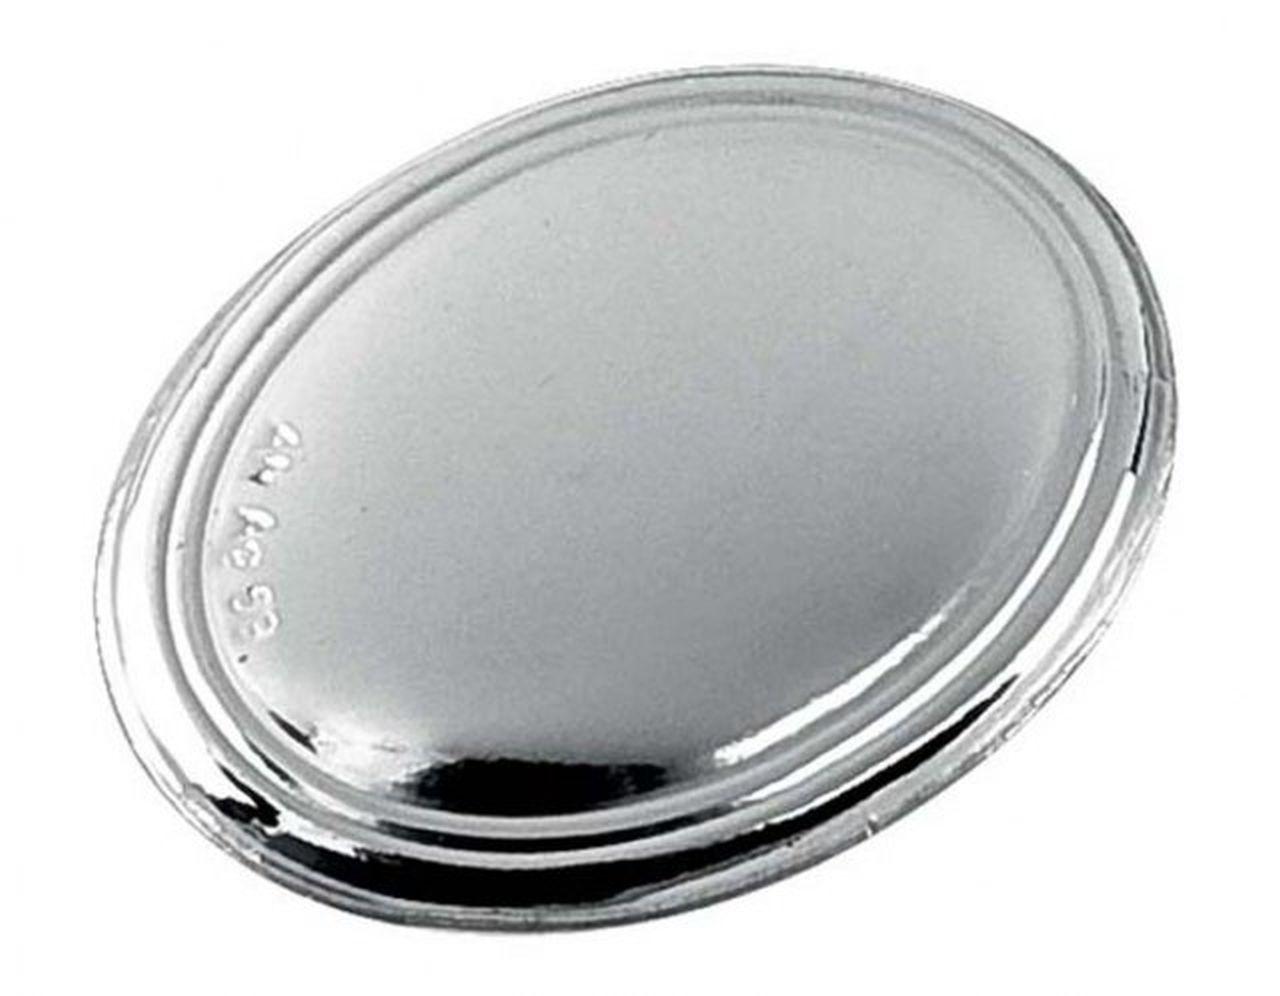 Blasone placca ovale mini in argento cm.2,5x1,6x0,3h